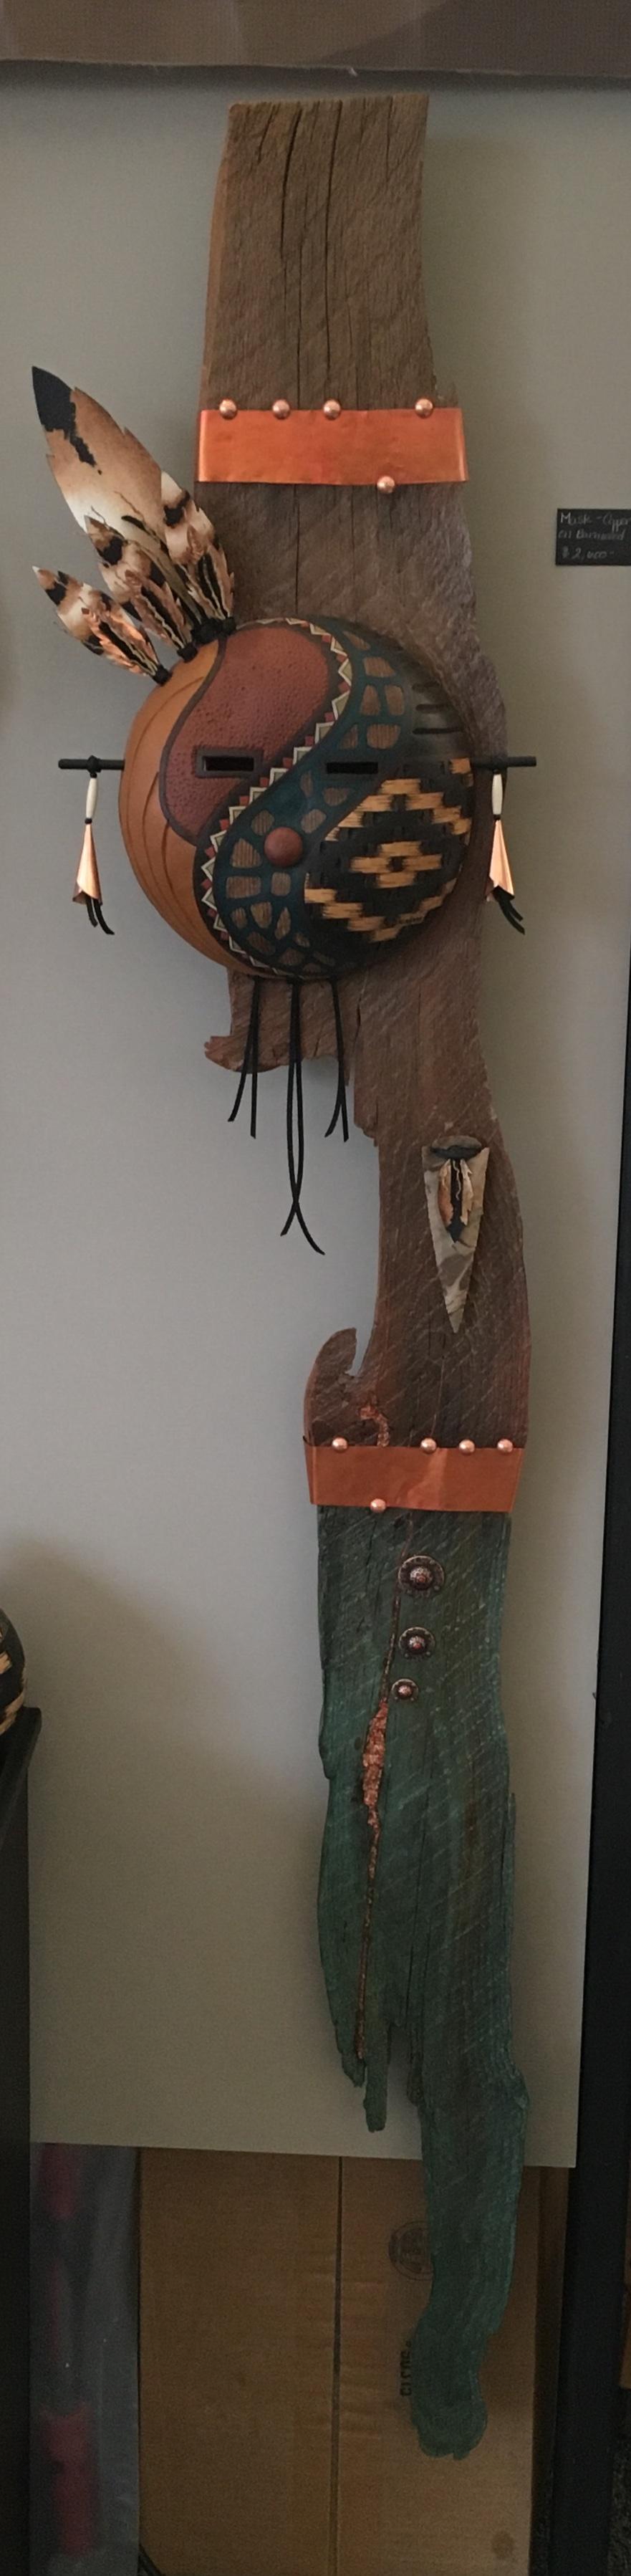 Mask on repurposed barn wood